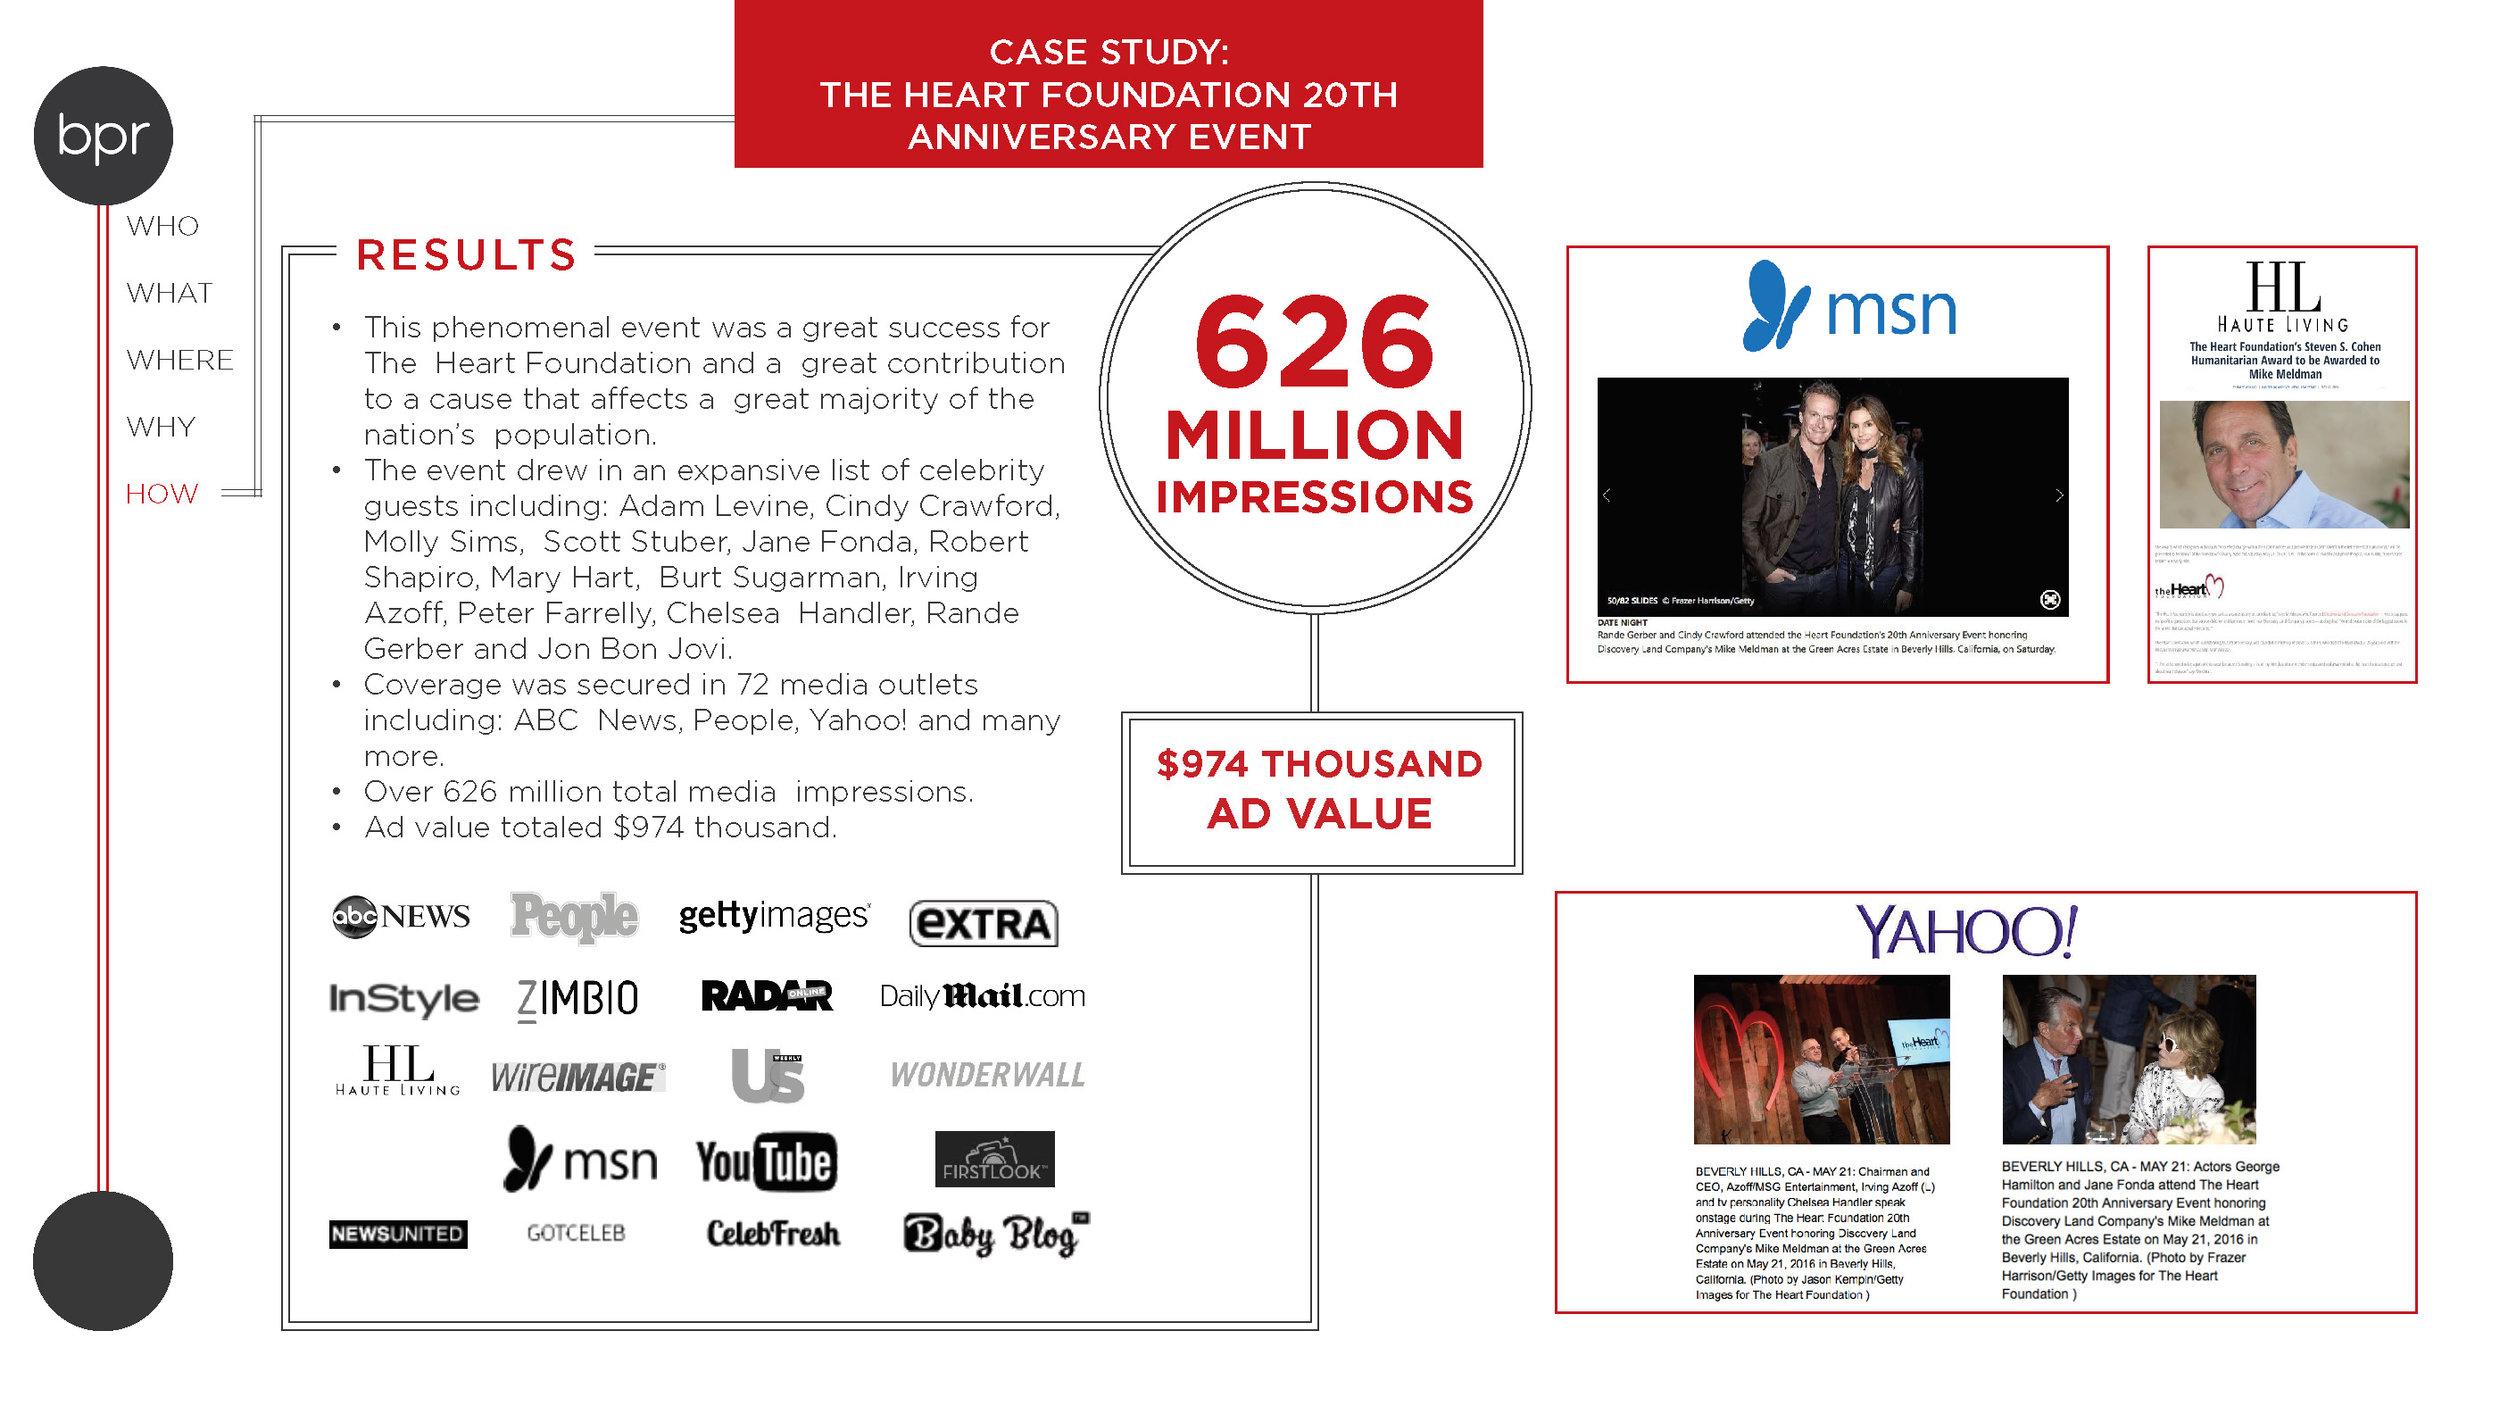 Heart Foundation Case Study_Page_3.jpg